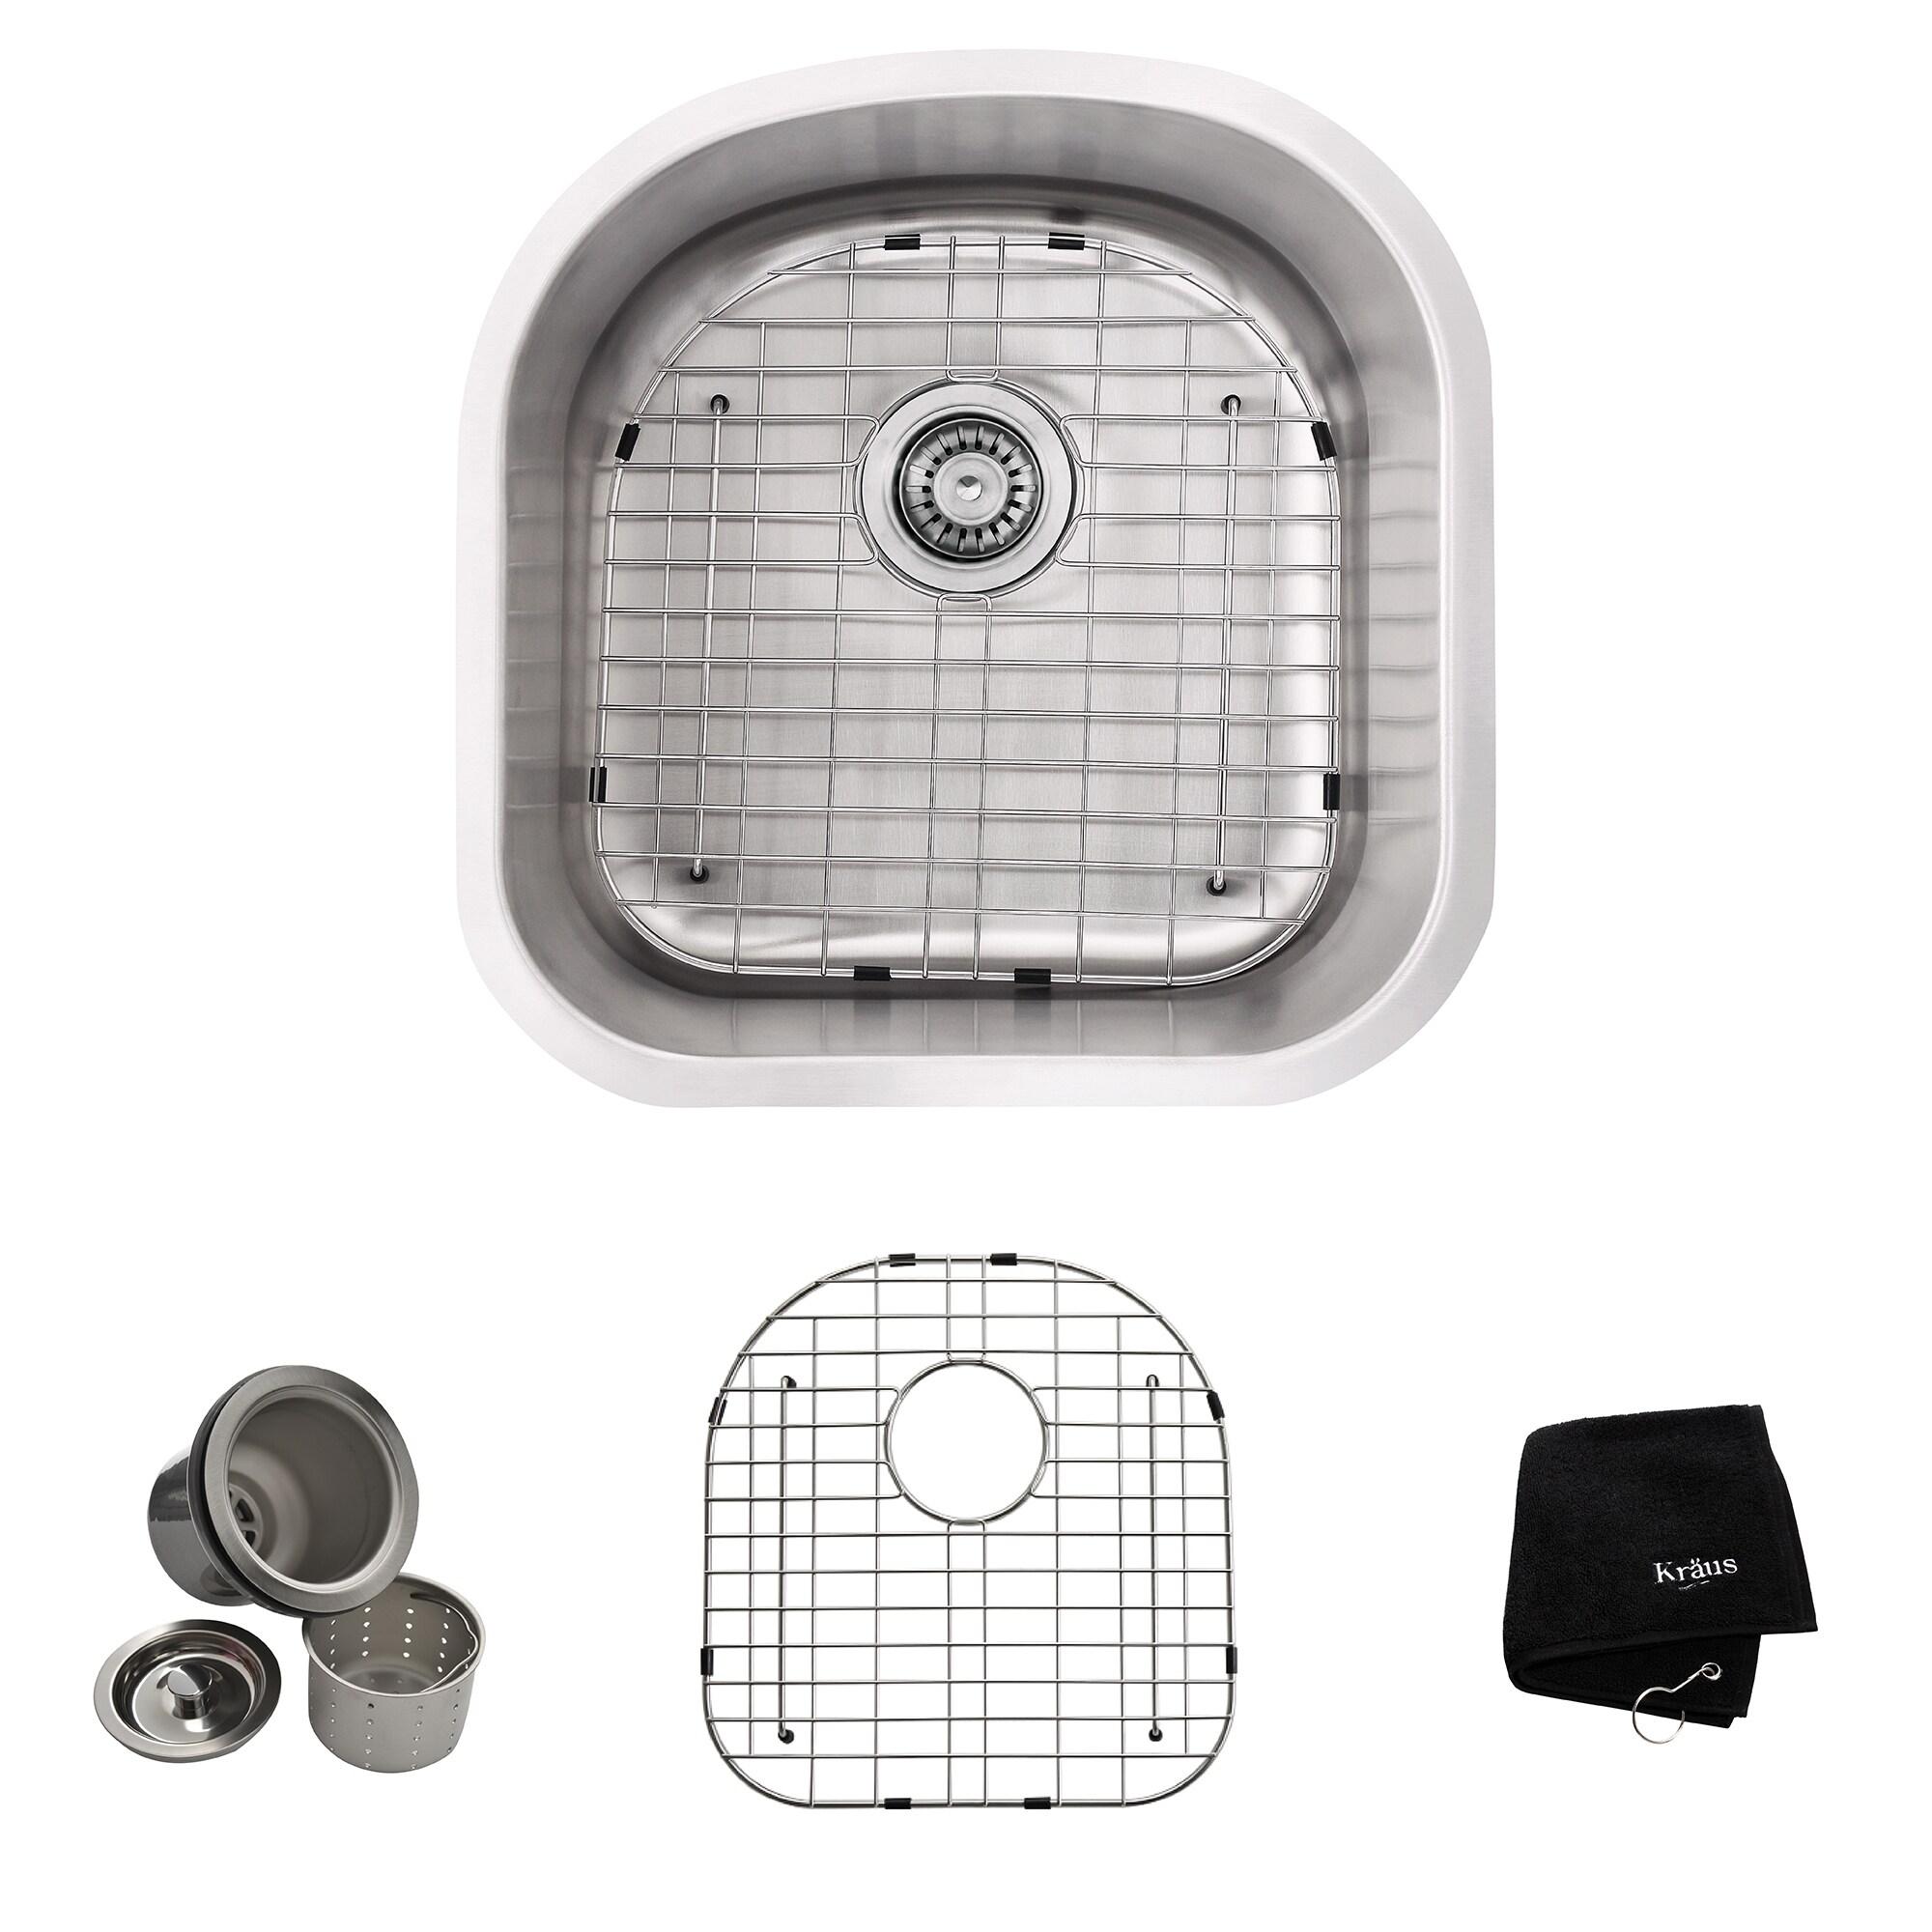 Shop kraus kbu15 premier undermount 20 in 16g 1 bowl satin stainless steel kitchen sink grid strainer towel free shipping today overstock 6472922